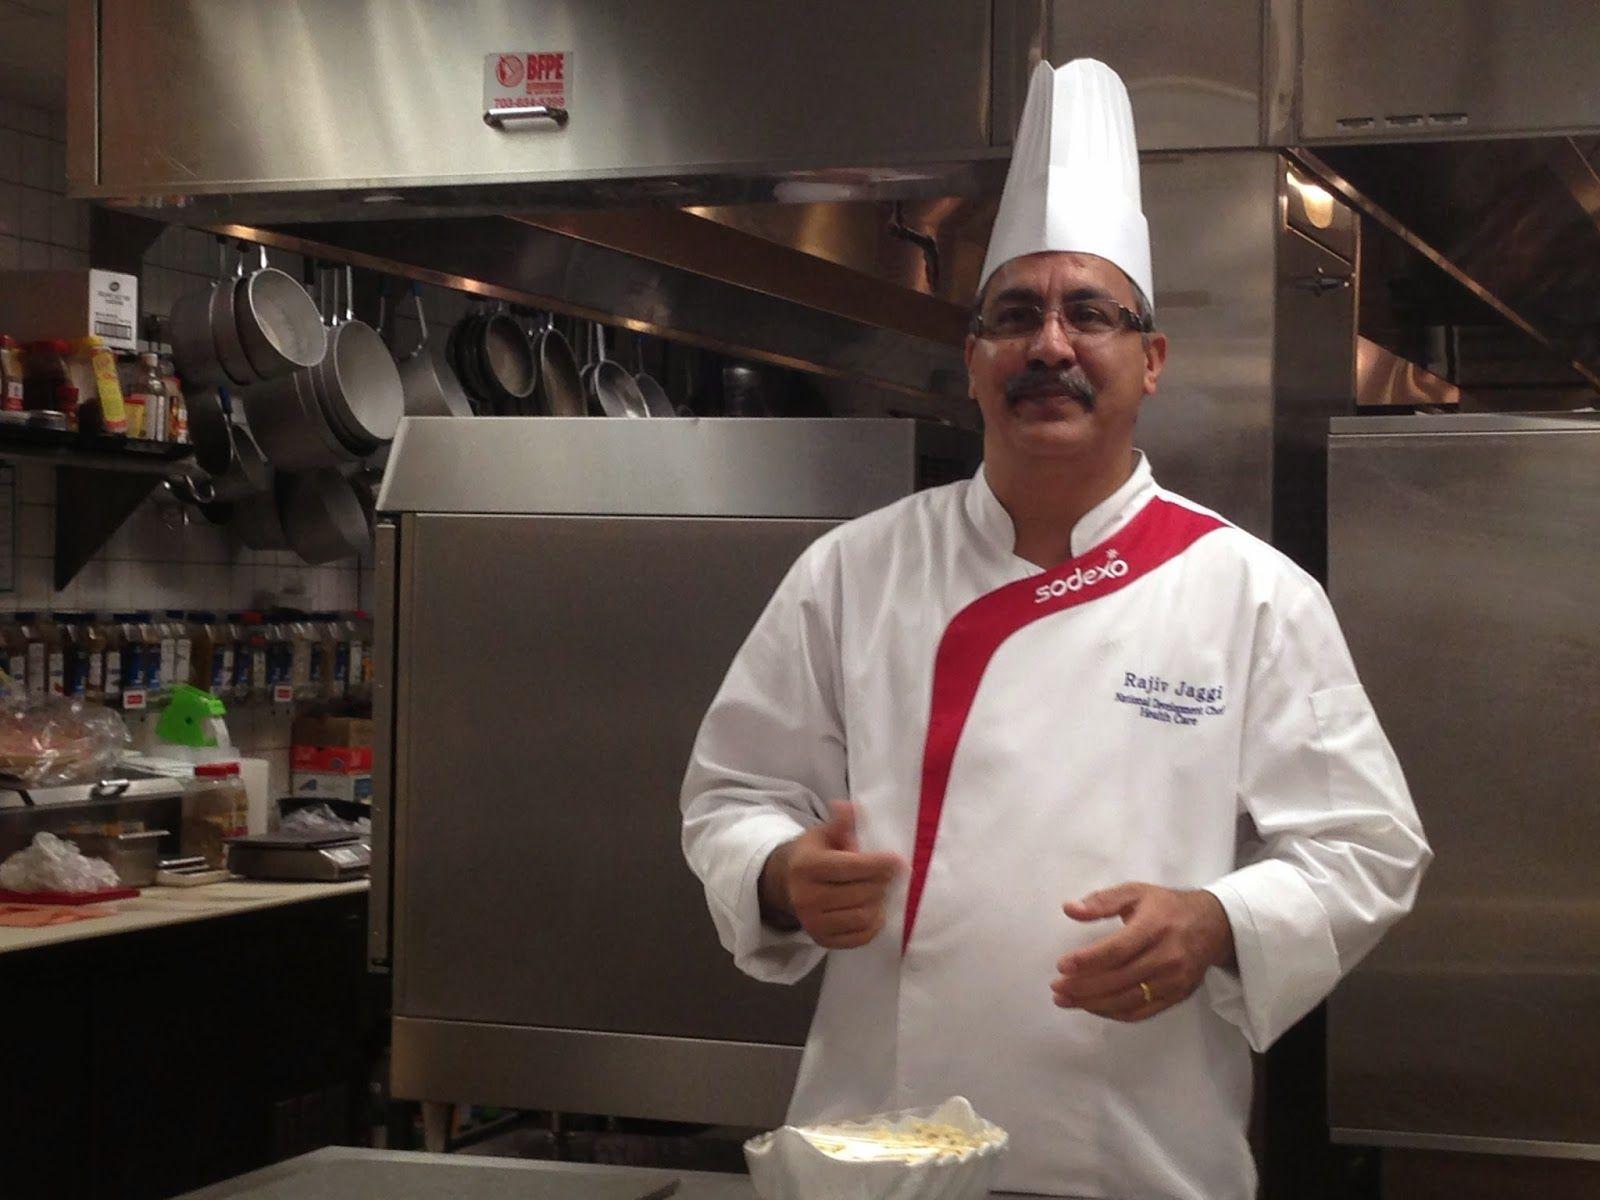 Sodexo Chef Jobs Chef Jobs Pinterest